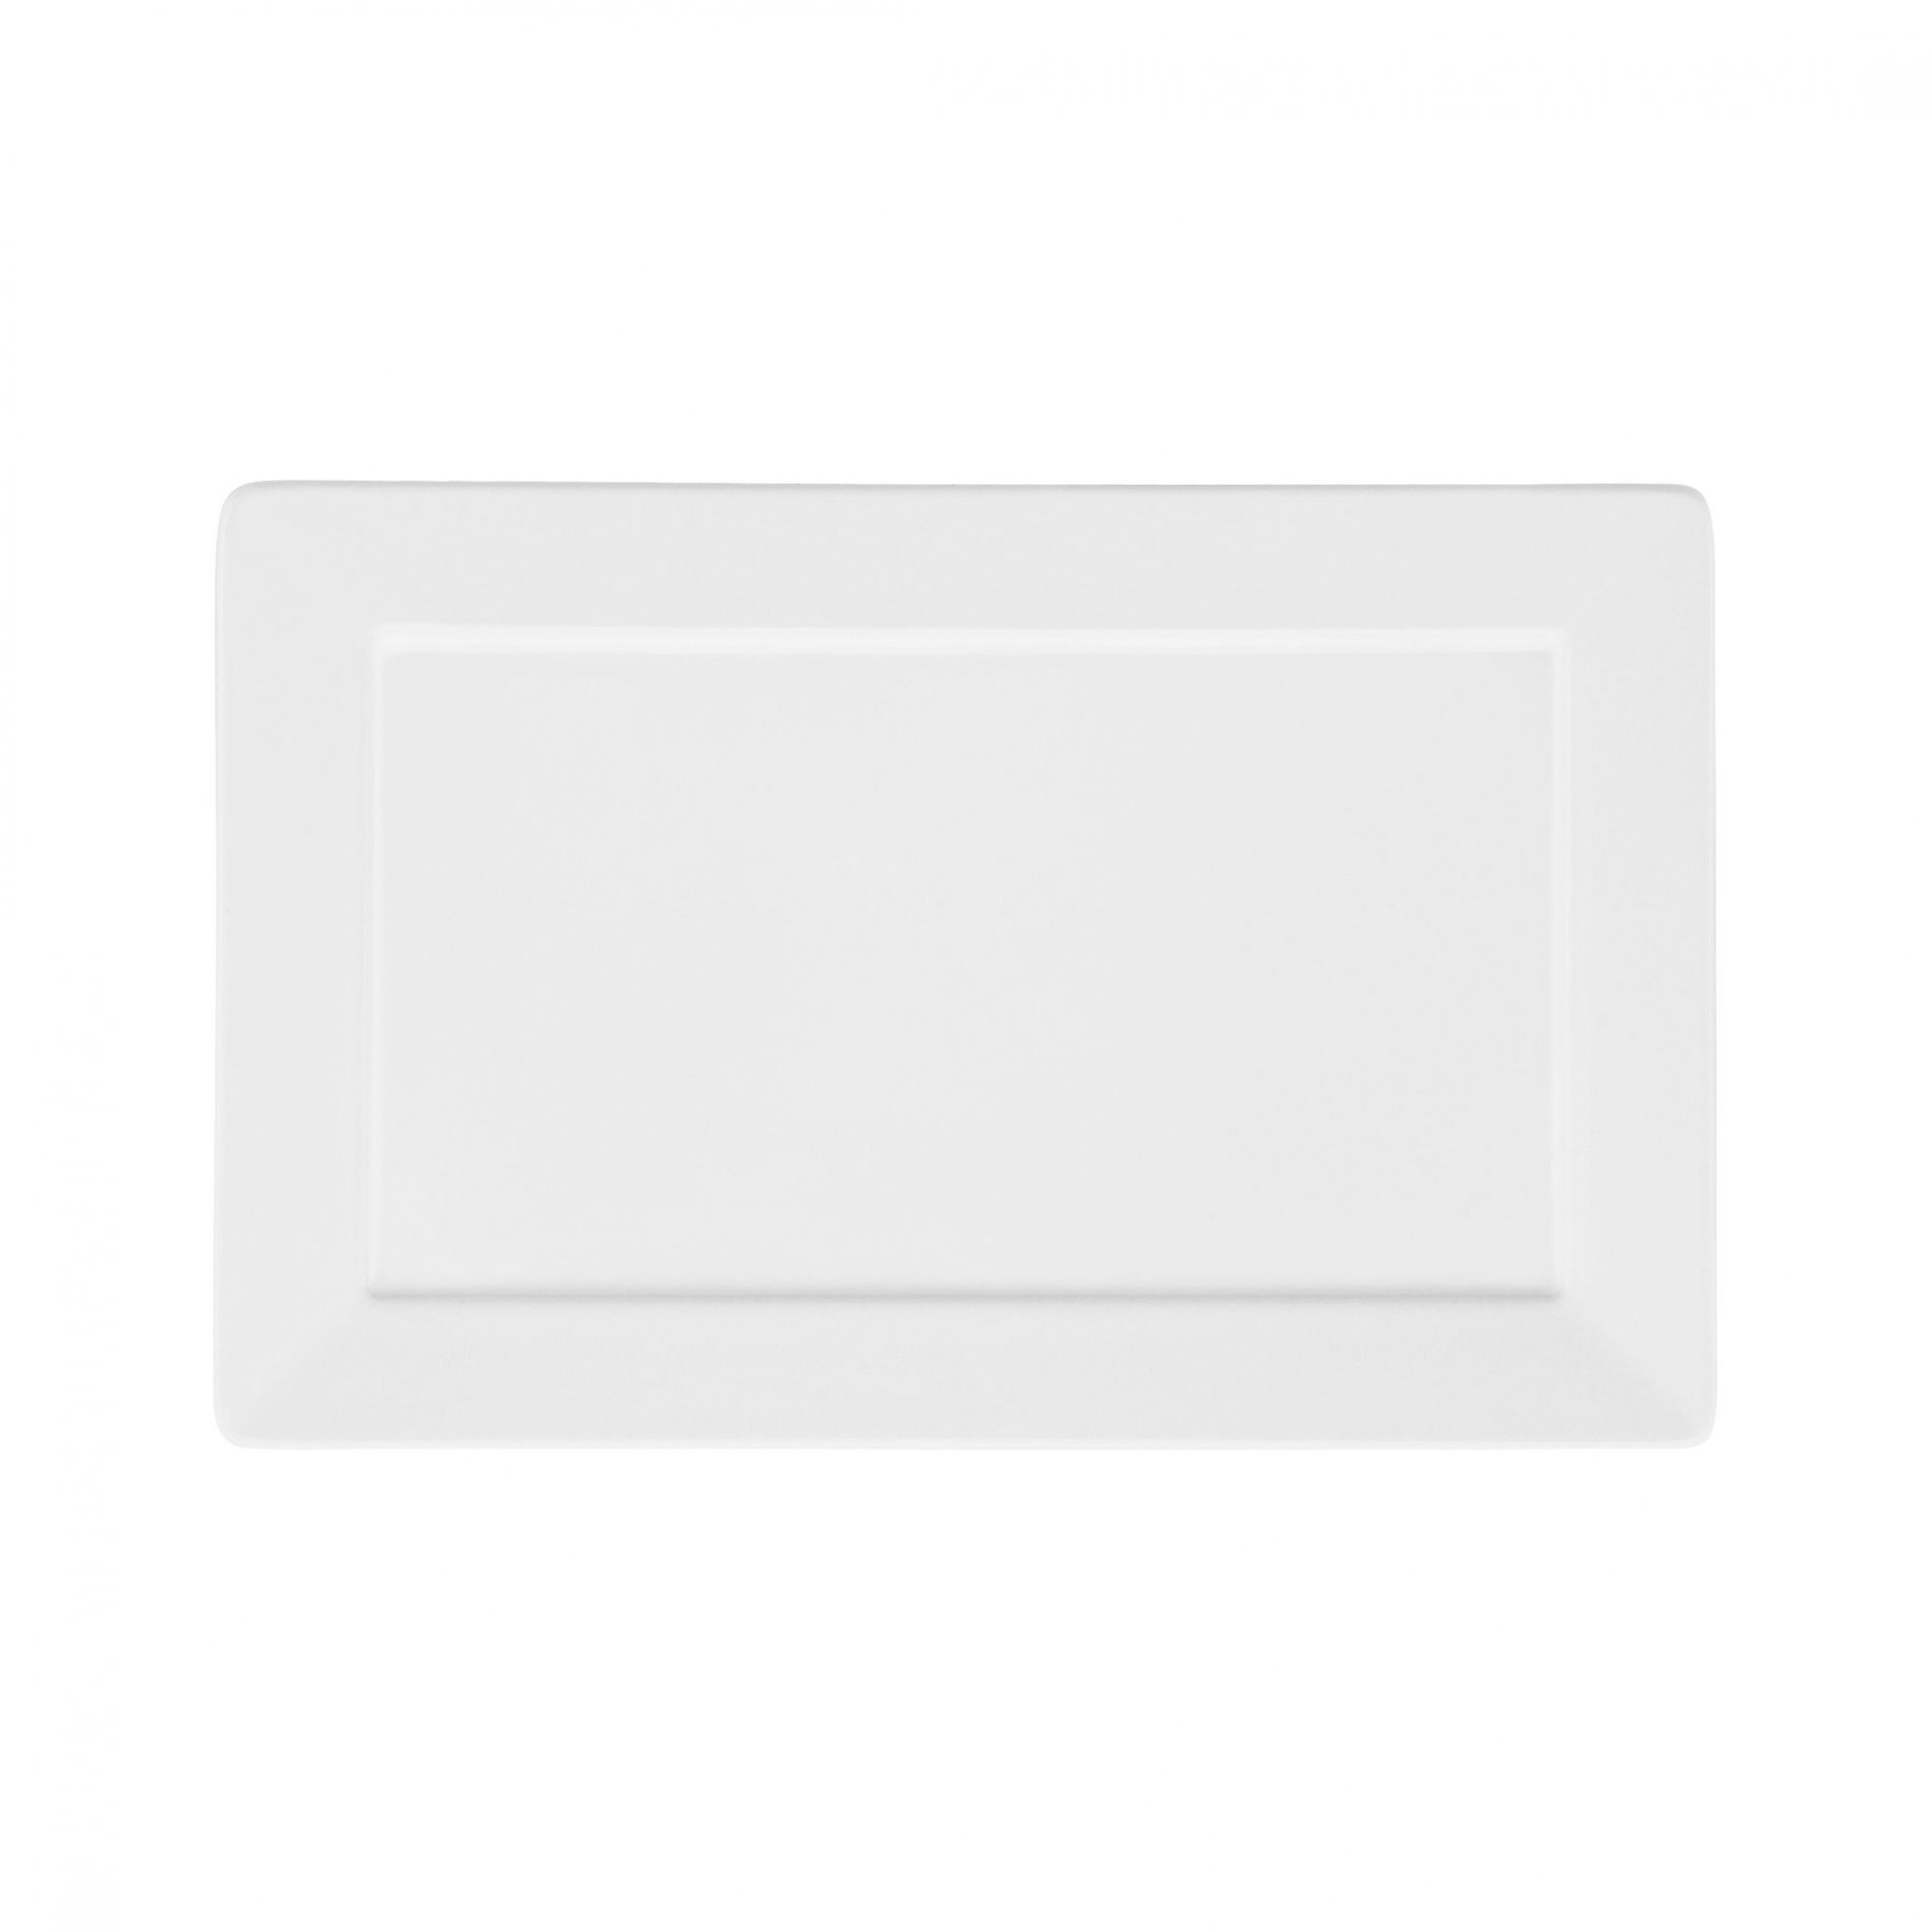 Prato Sobremesa 25x16 cm Plateau White